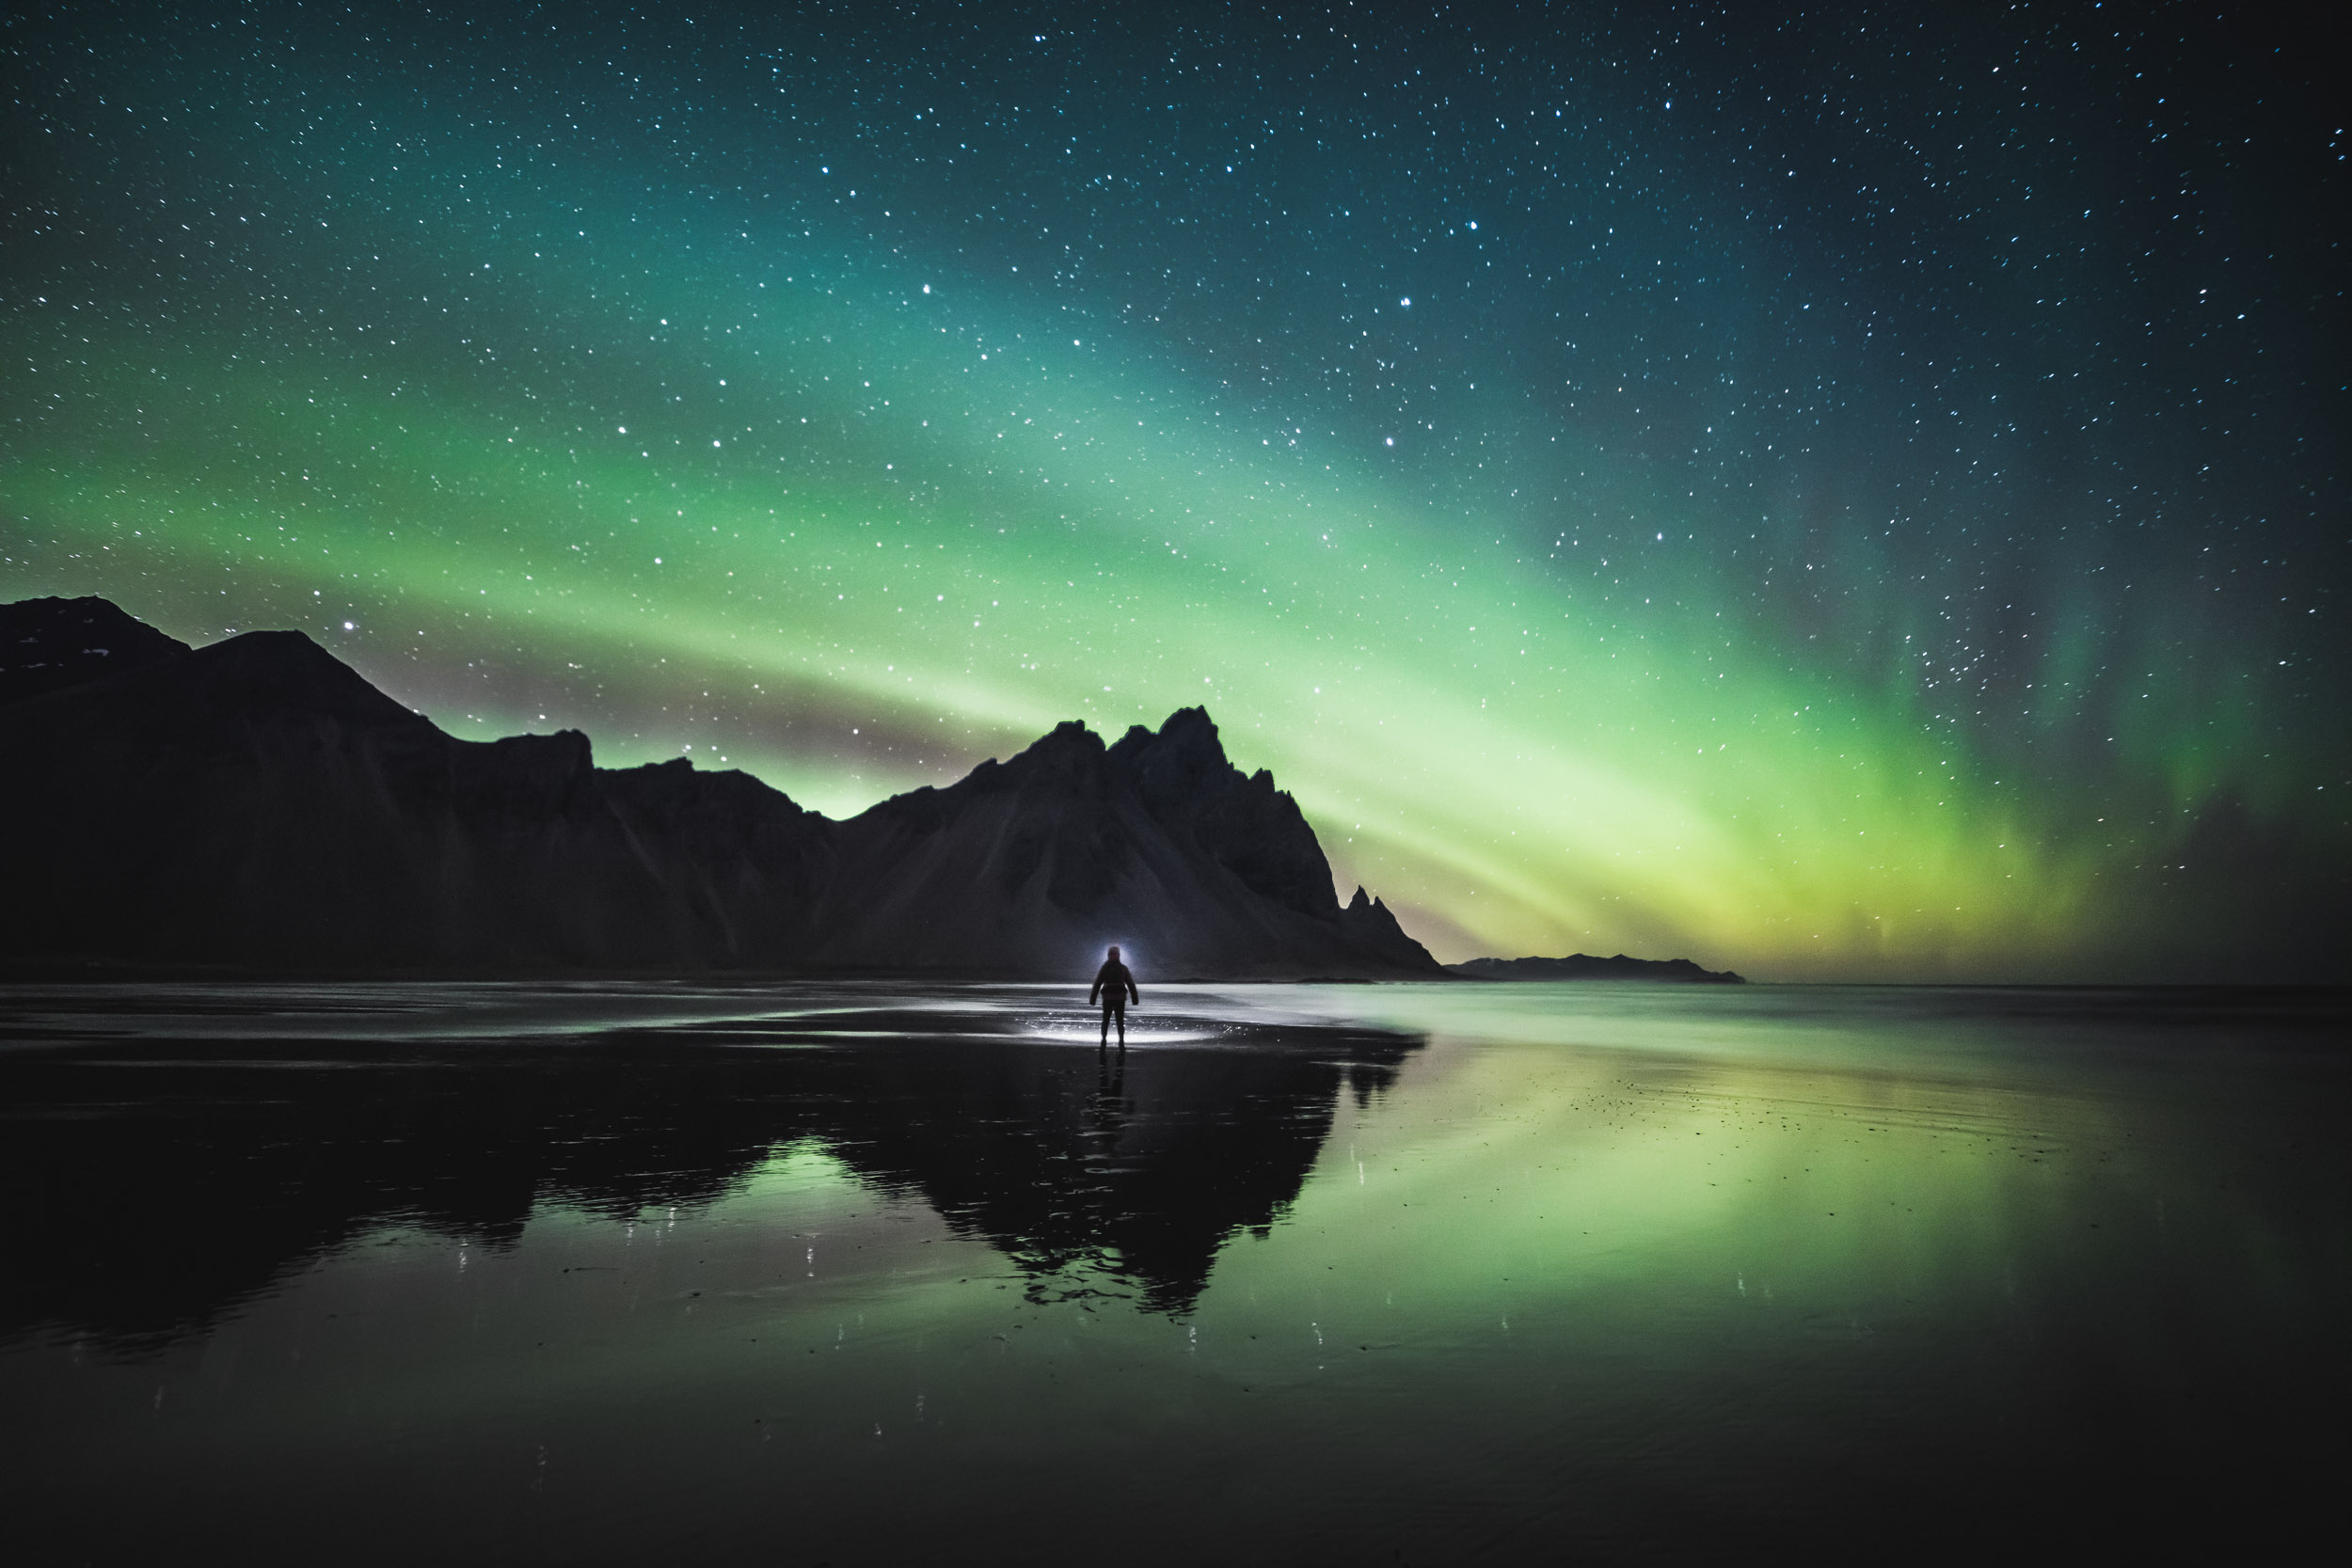 Iceland_Jan_2019_ByTomKahler_Lowres (139 of 262).jpg